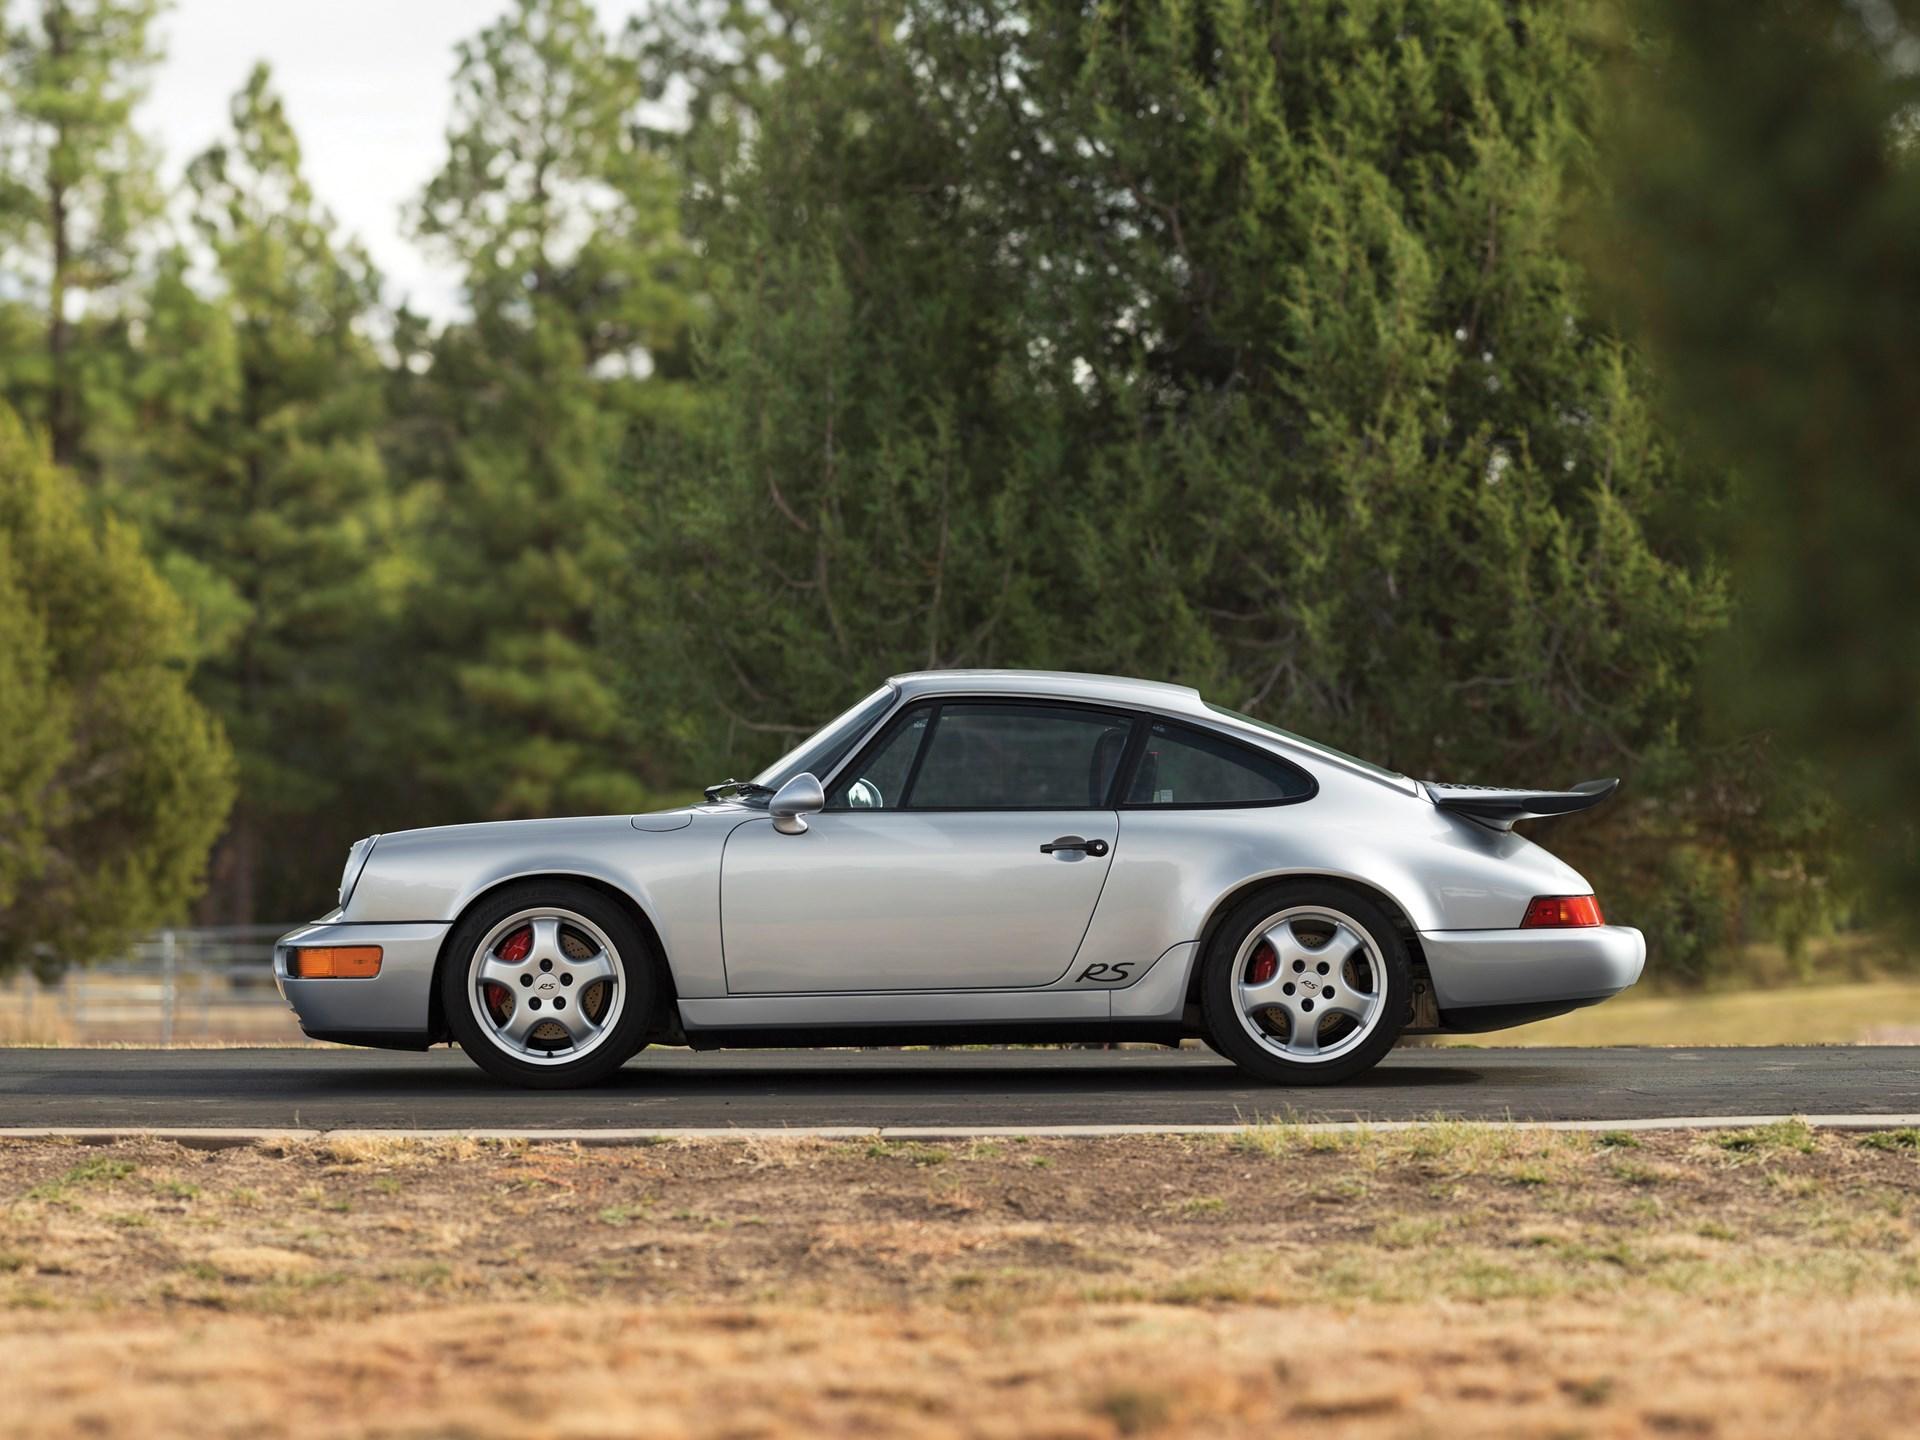 1993 Porsche 911 Carrera RS America